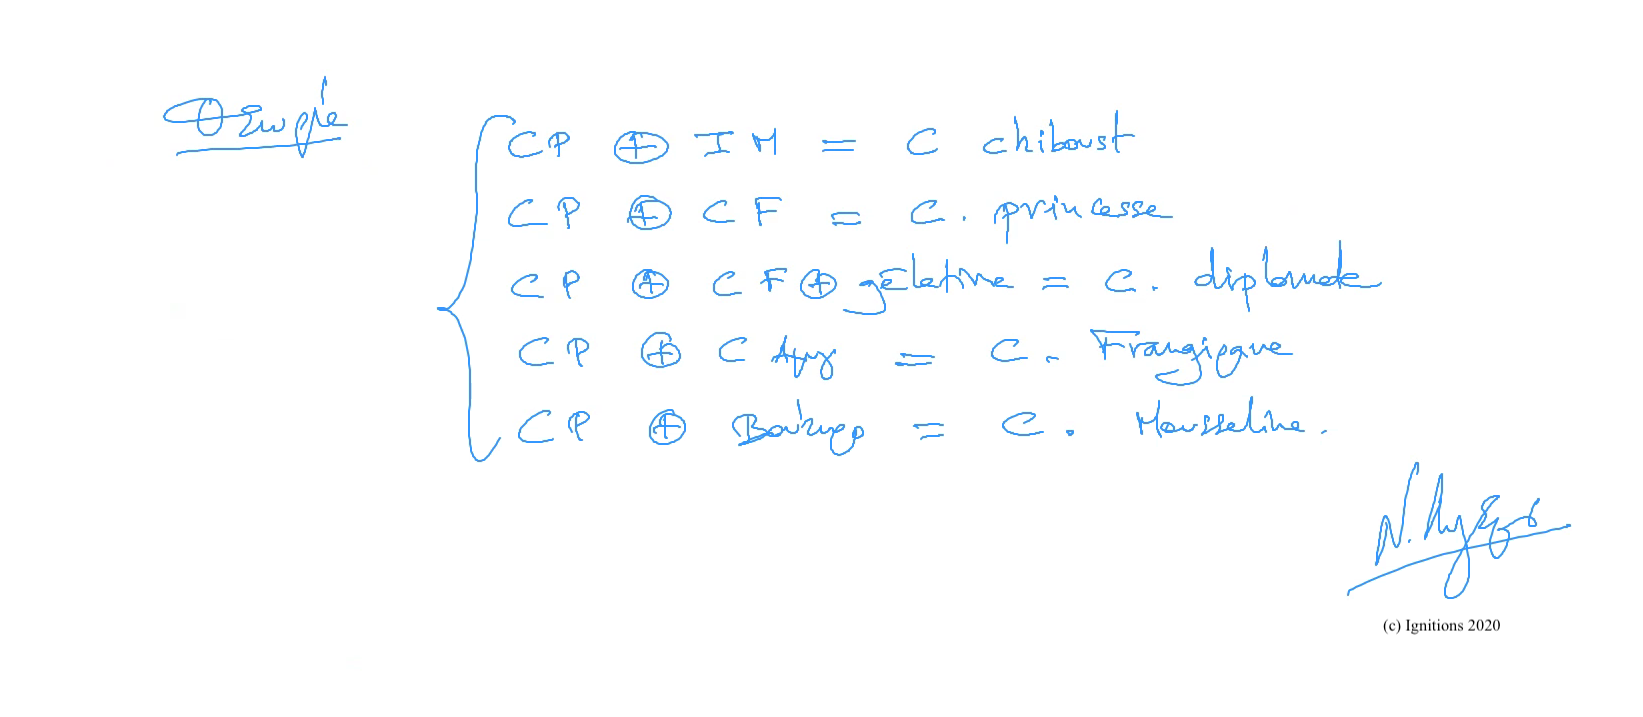 56787 - e-Μάθημα III: Πηγές και θεμέλια ζαχαροπλαστικής. (Dessin)